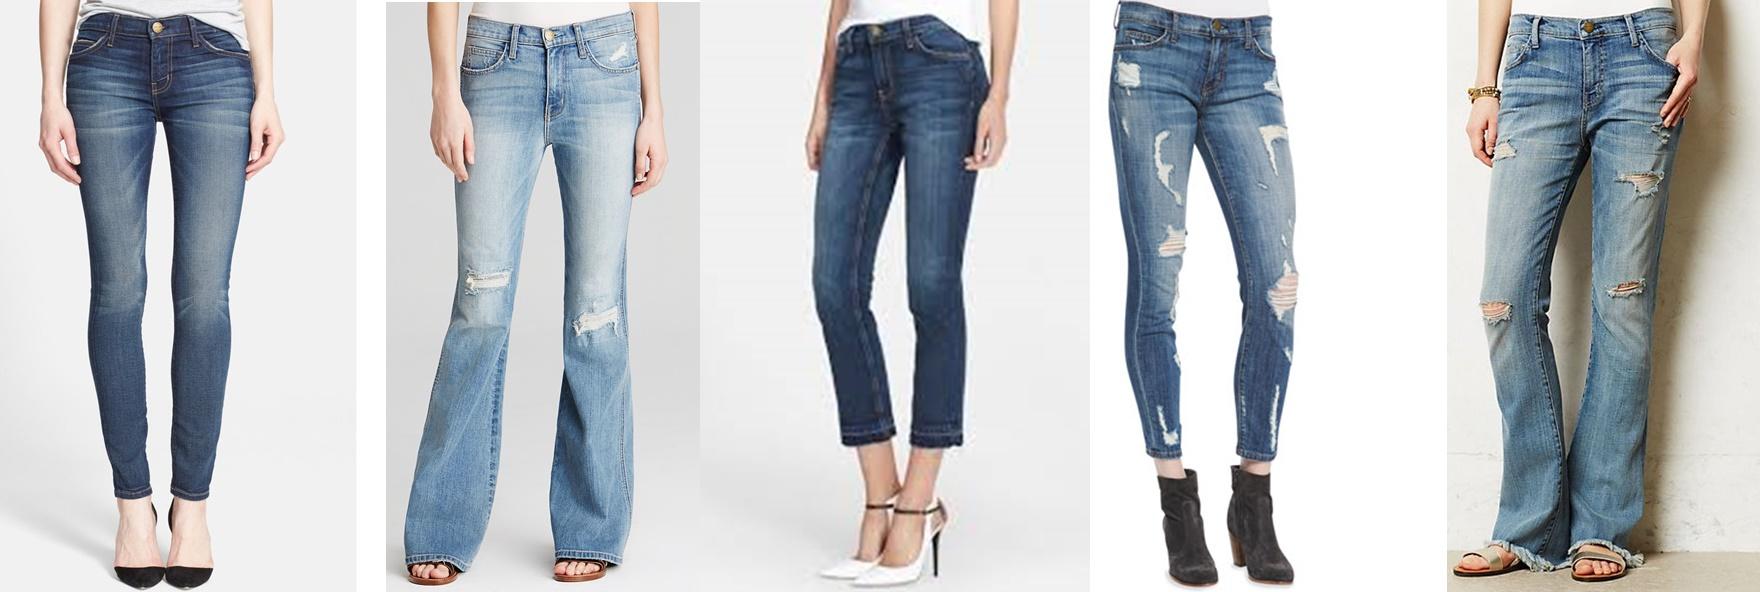 jeans02.jpg